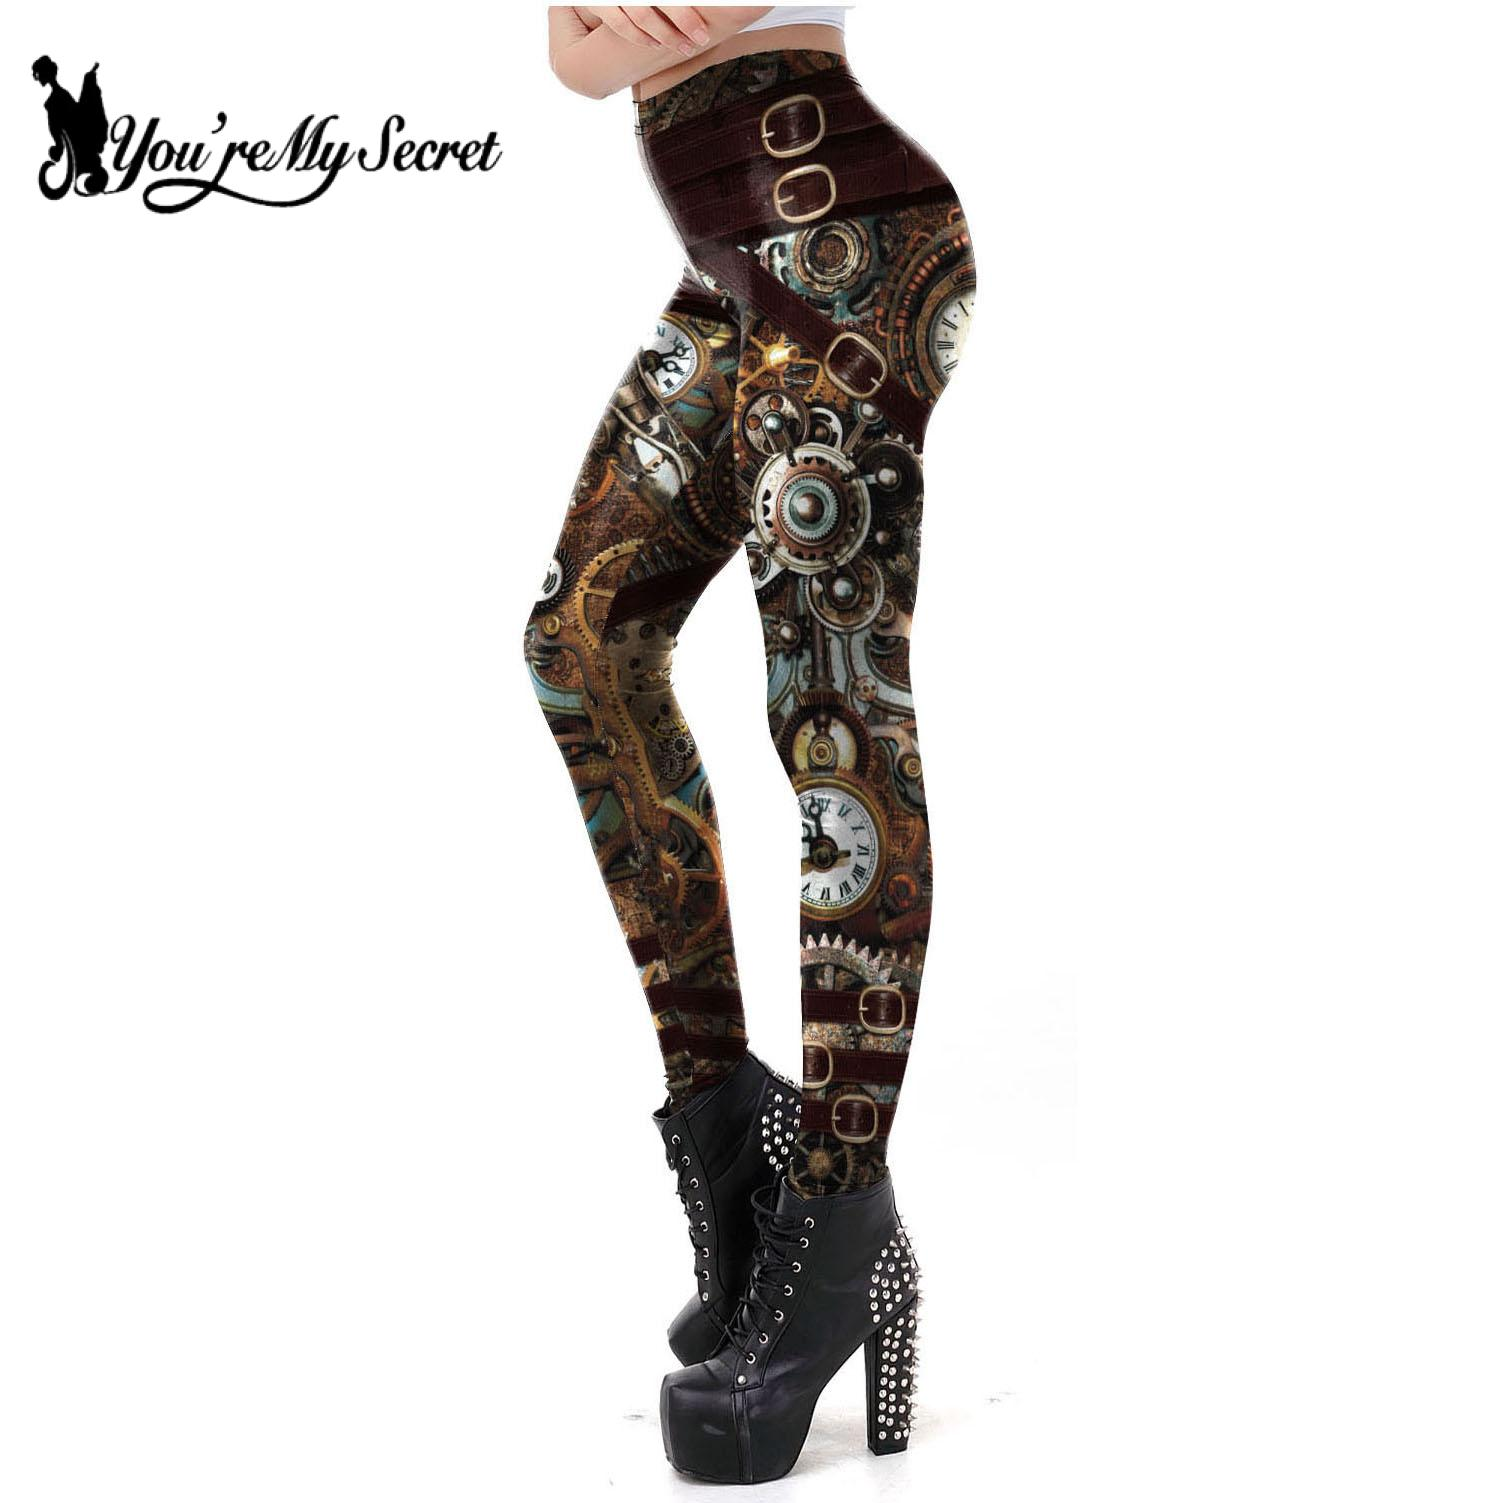 [You're My Secret] Vintage Mechanical Gear Women Leggings Workout Pants 3D Printed Steampunk Slim Leggins Fitness Sexy Legins